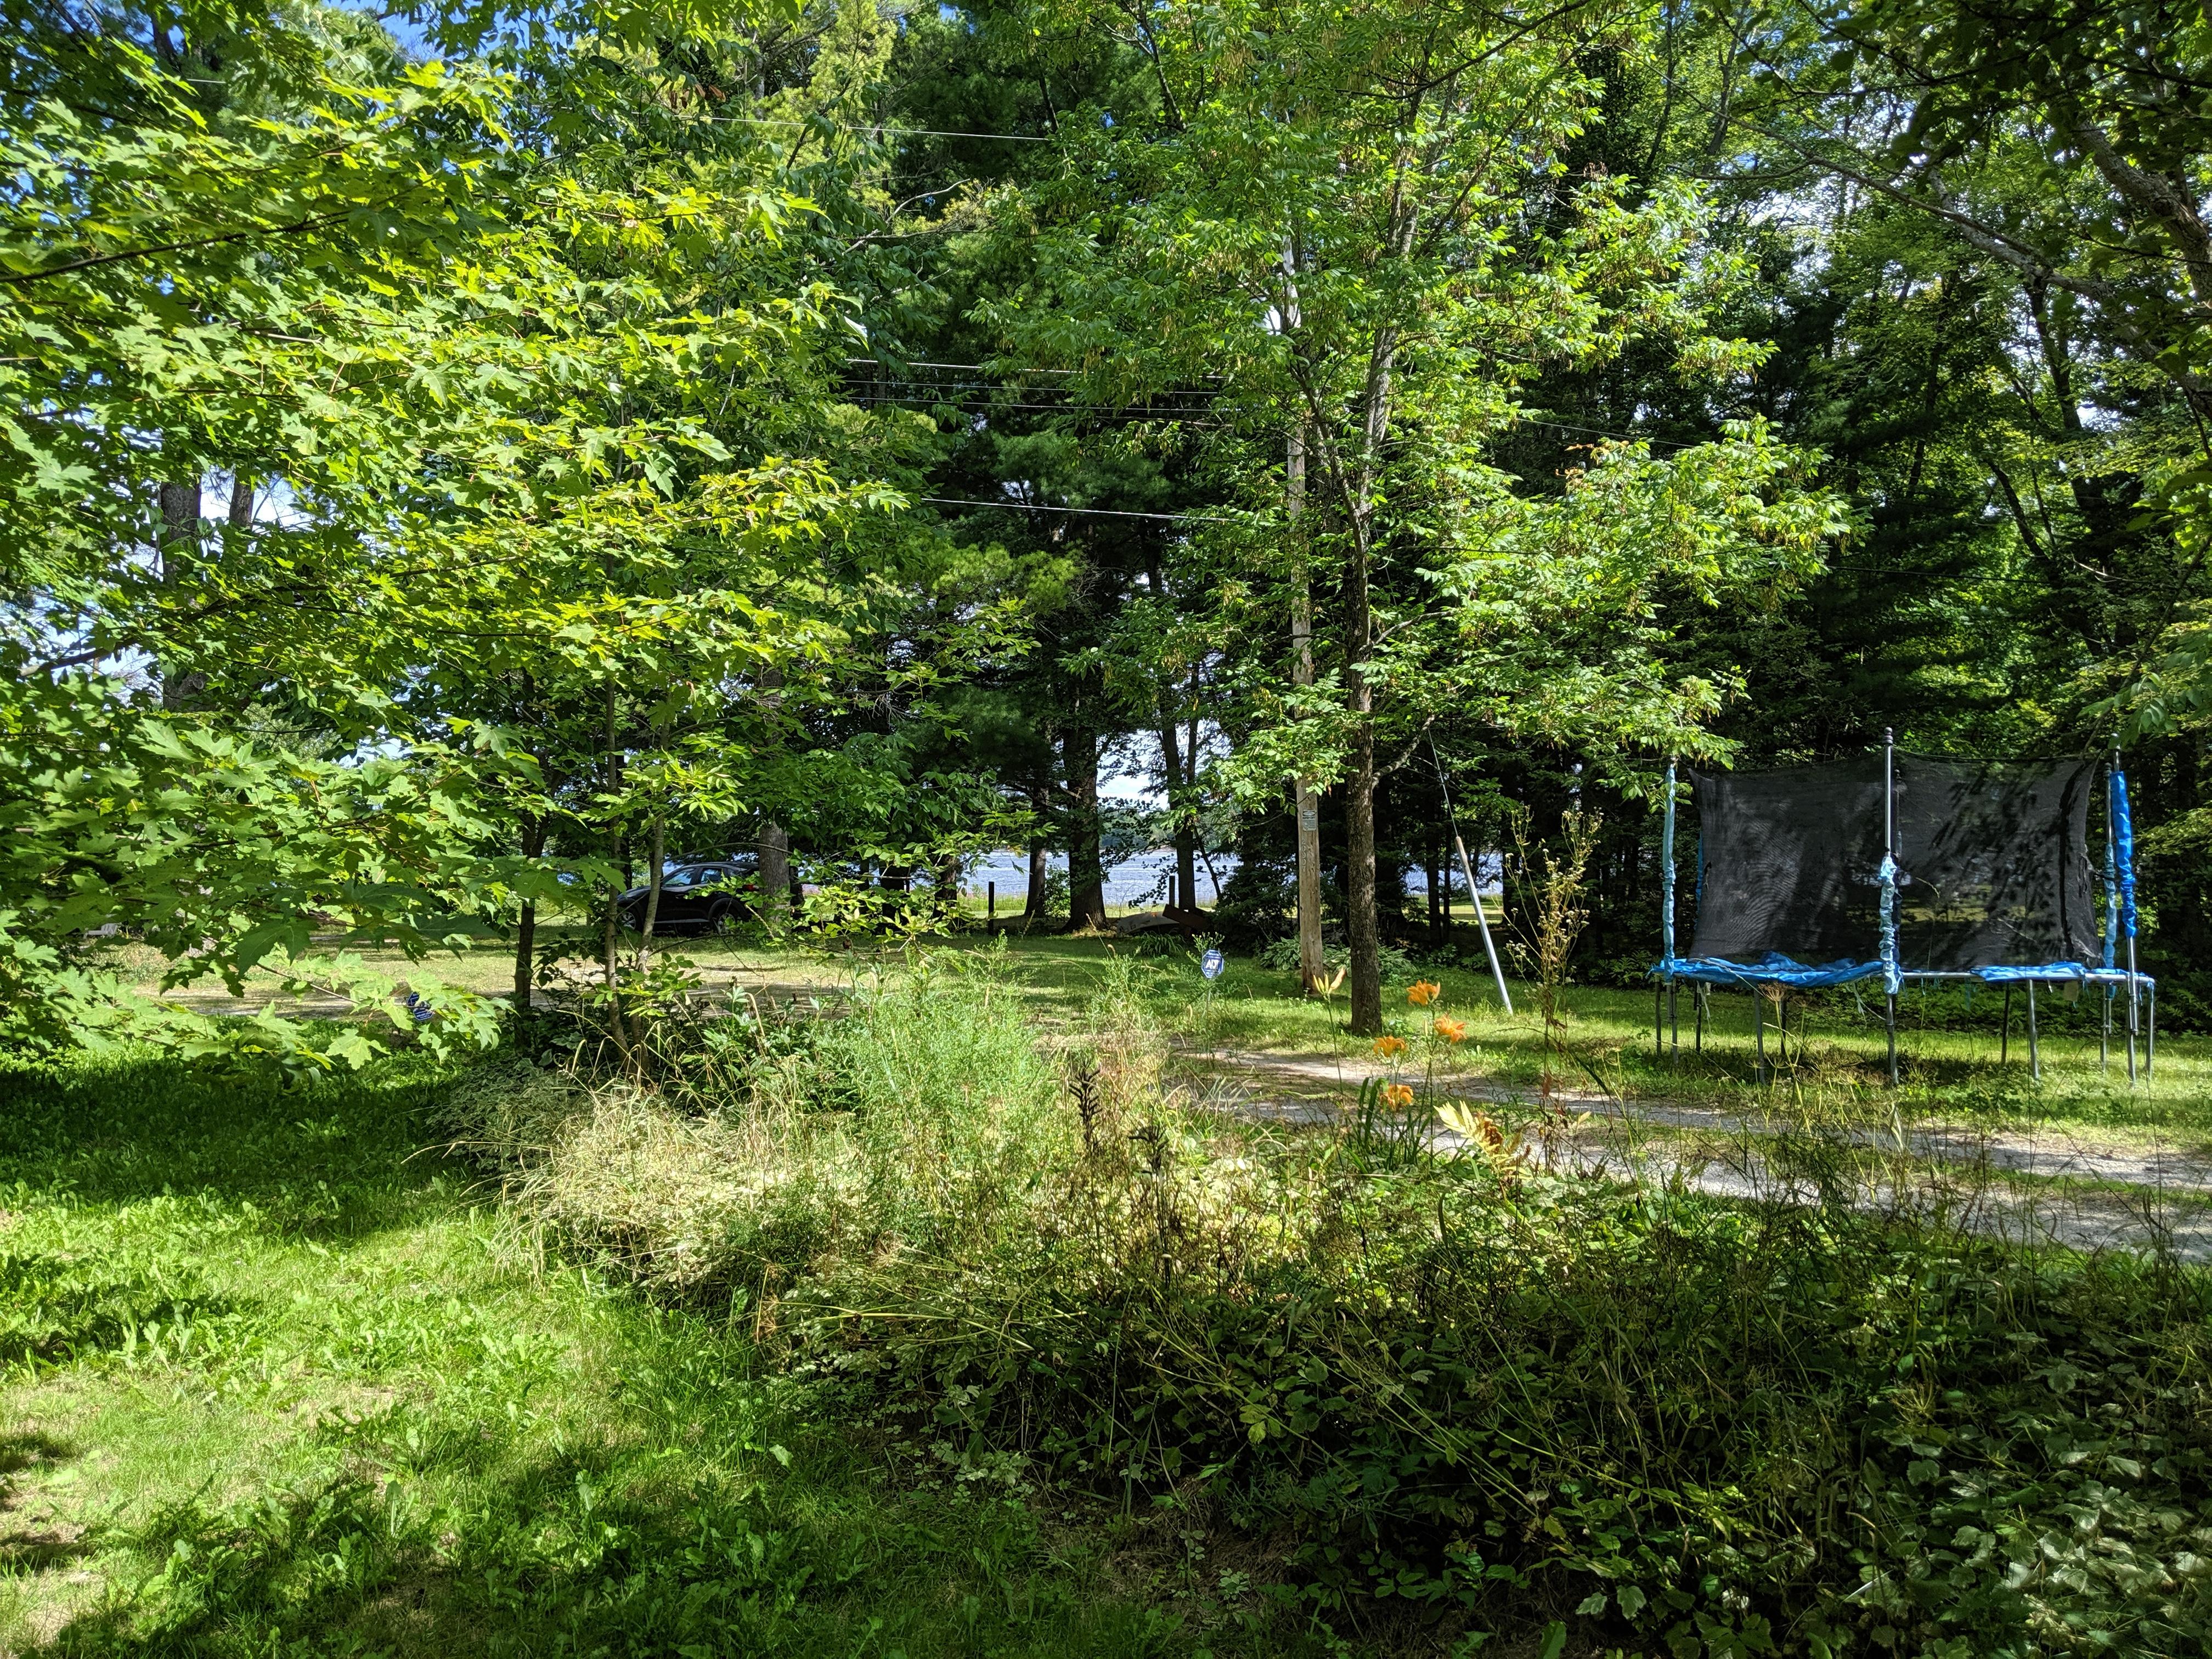 Backyard and Trampoline